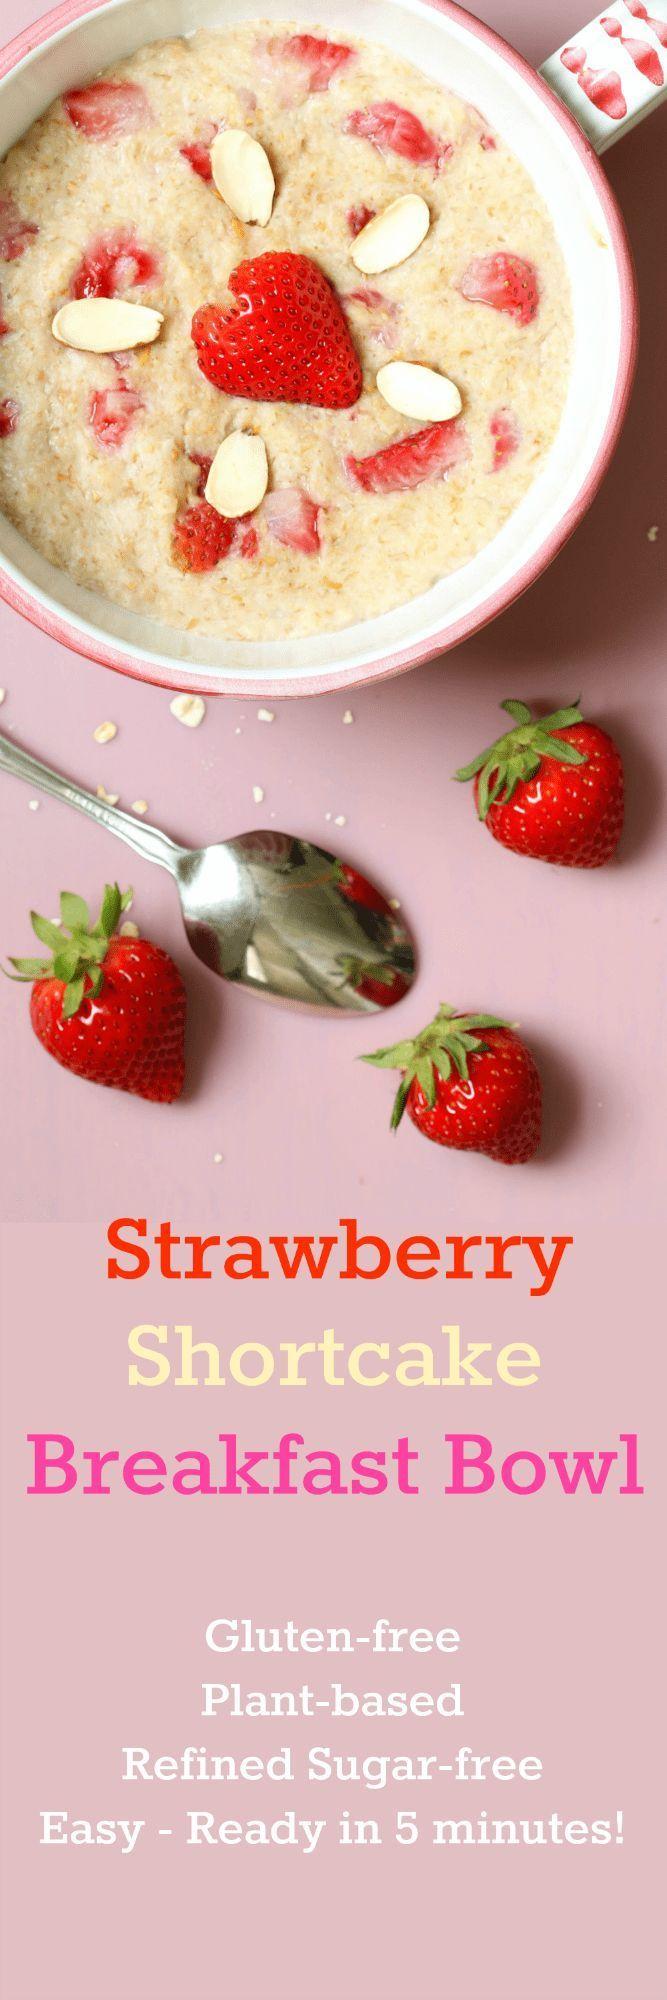 Strawberry Shortcake Breakfast Bowl (Gluten-free, Plant-based, Refined Sugar-free)